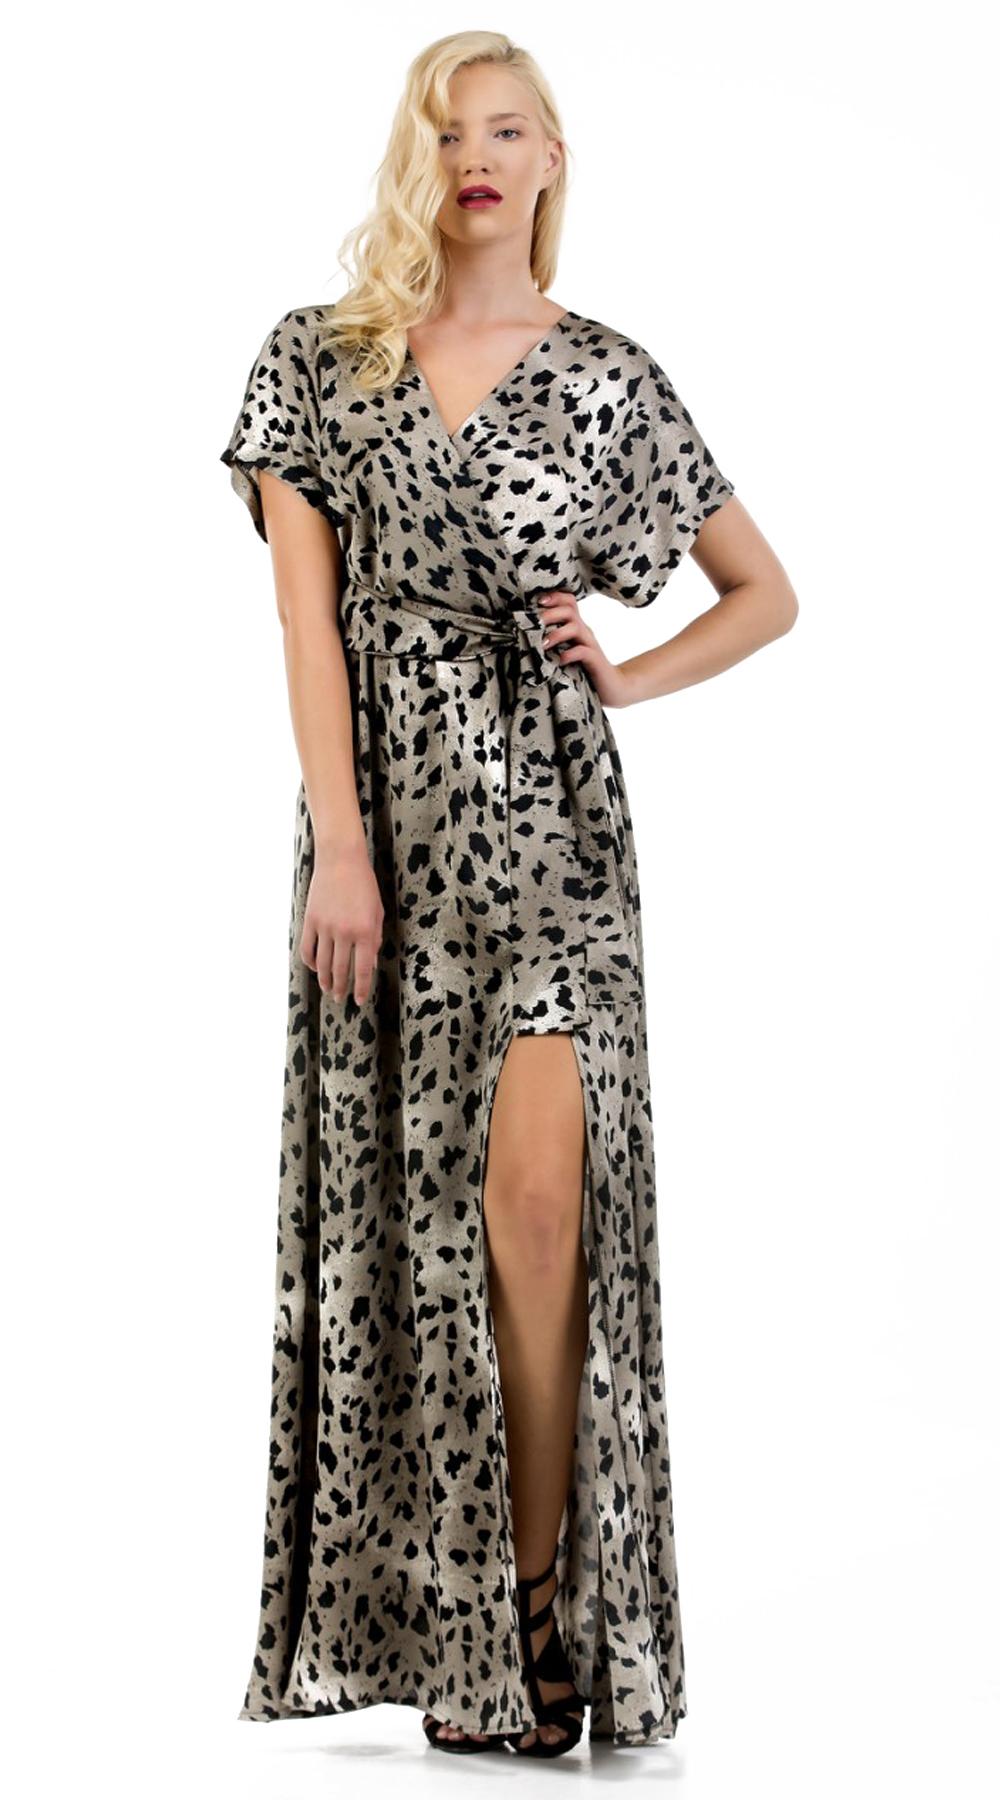 Wrap style φόρεμα με jungle print και σκίσιμο στο πόδι Online - ONLINE - F17ON-5 φορέματα μάξι φορέματα